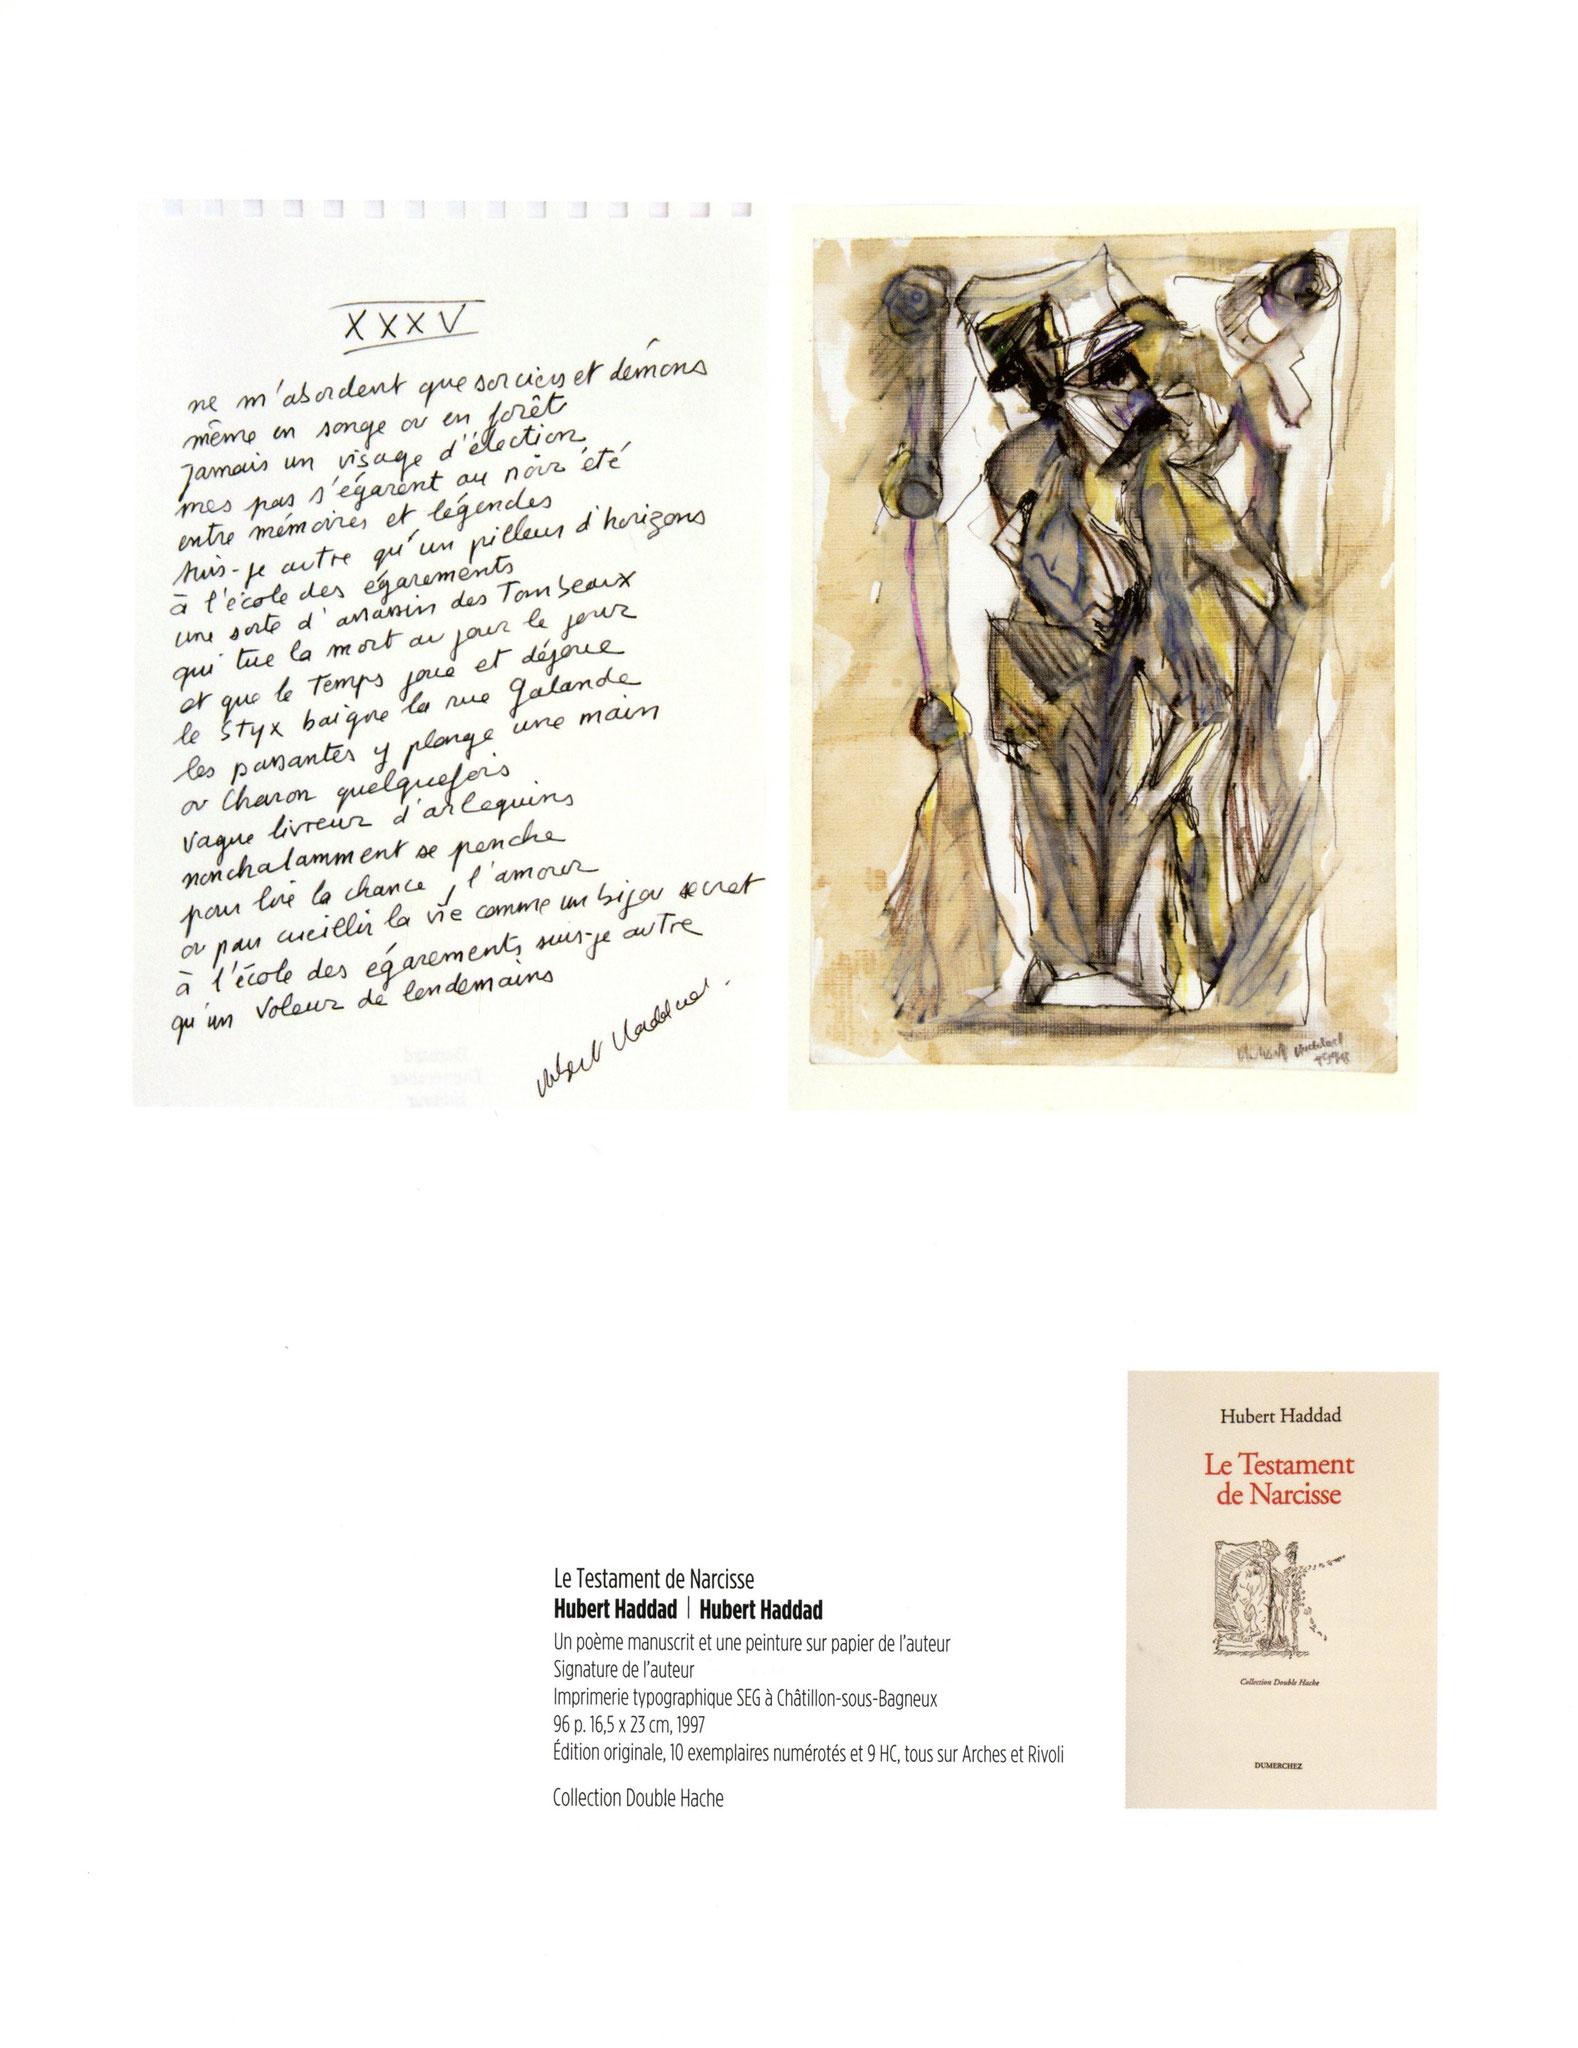 Le testament de Narcisse - Hubert Haddad / Hubert Haddad